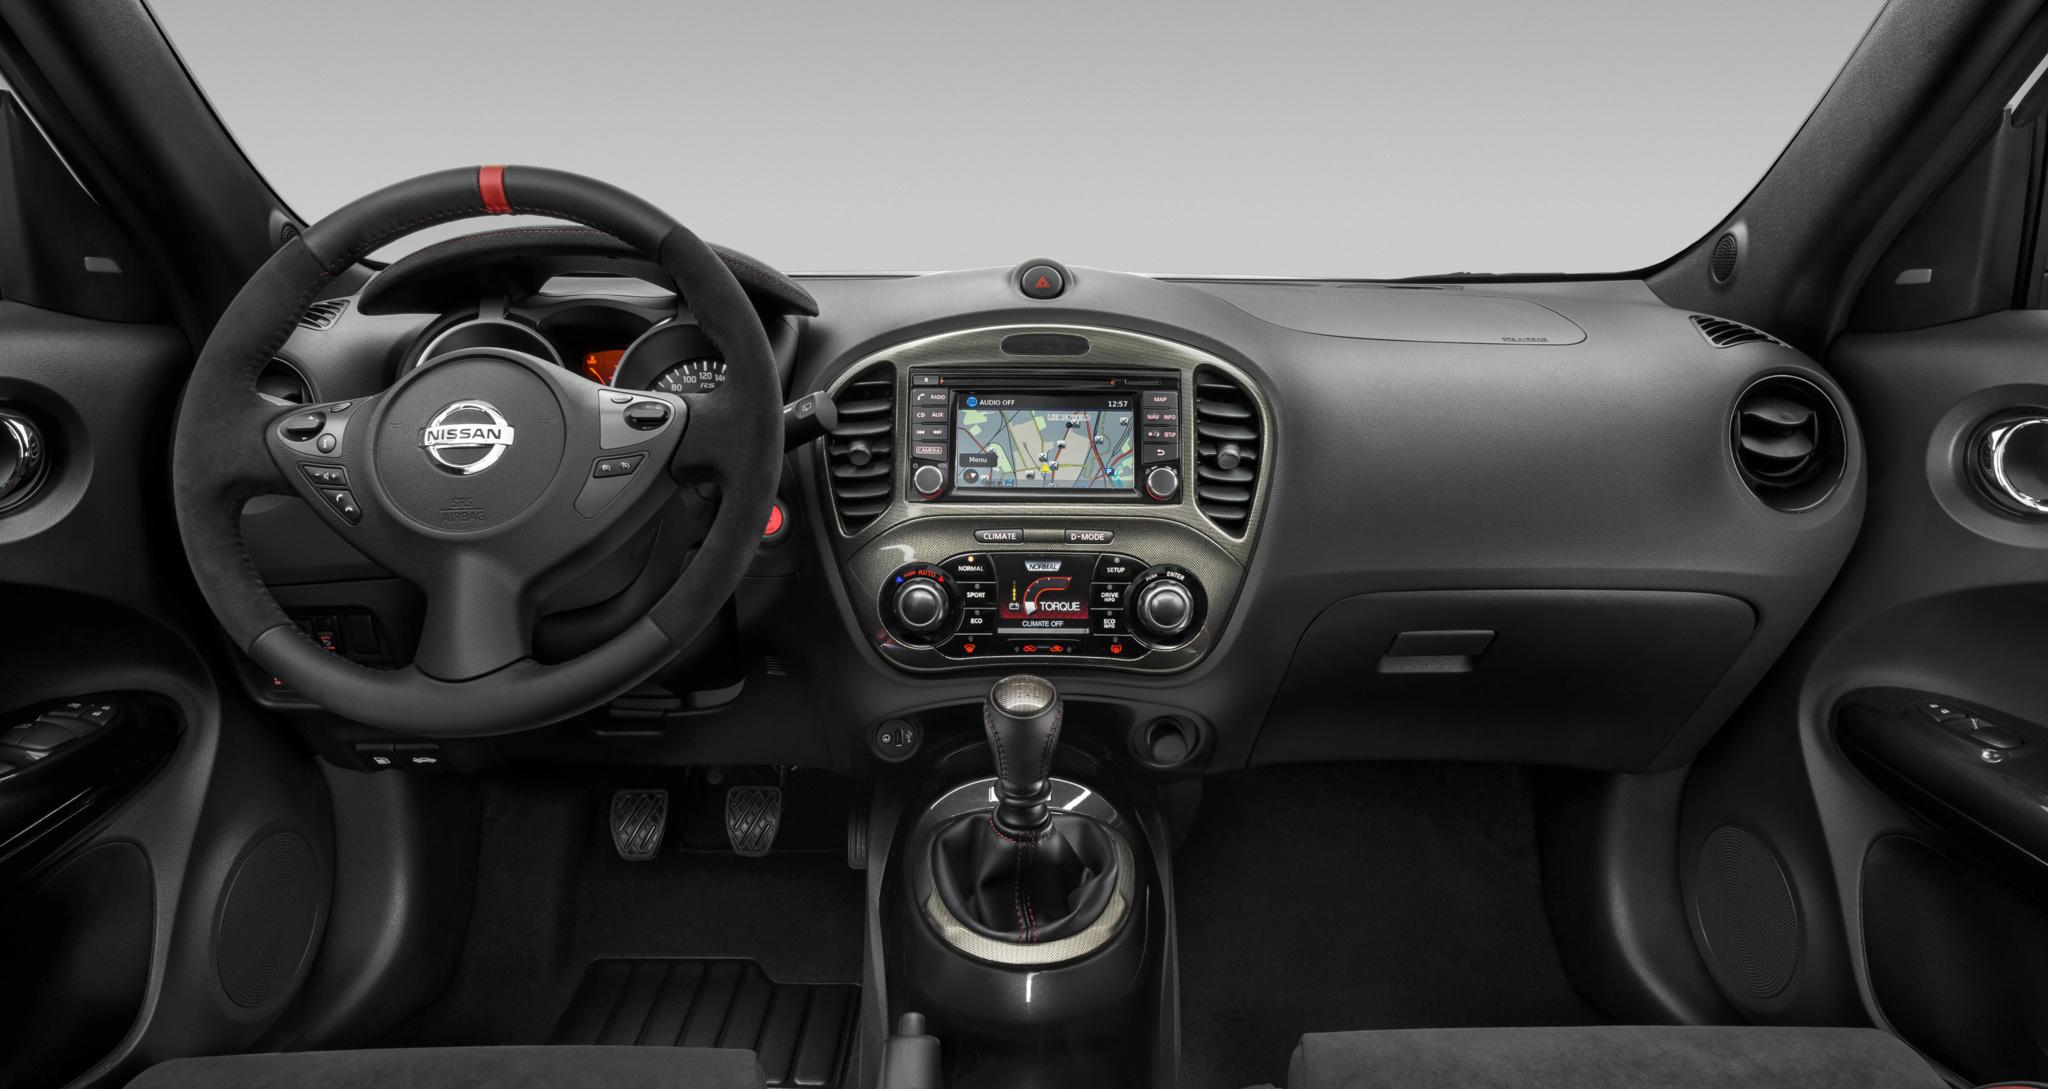 Nissan Juke Nismo Rs 218 Caballos Por 23 700 Euros Motor El Mundo